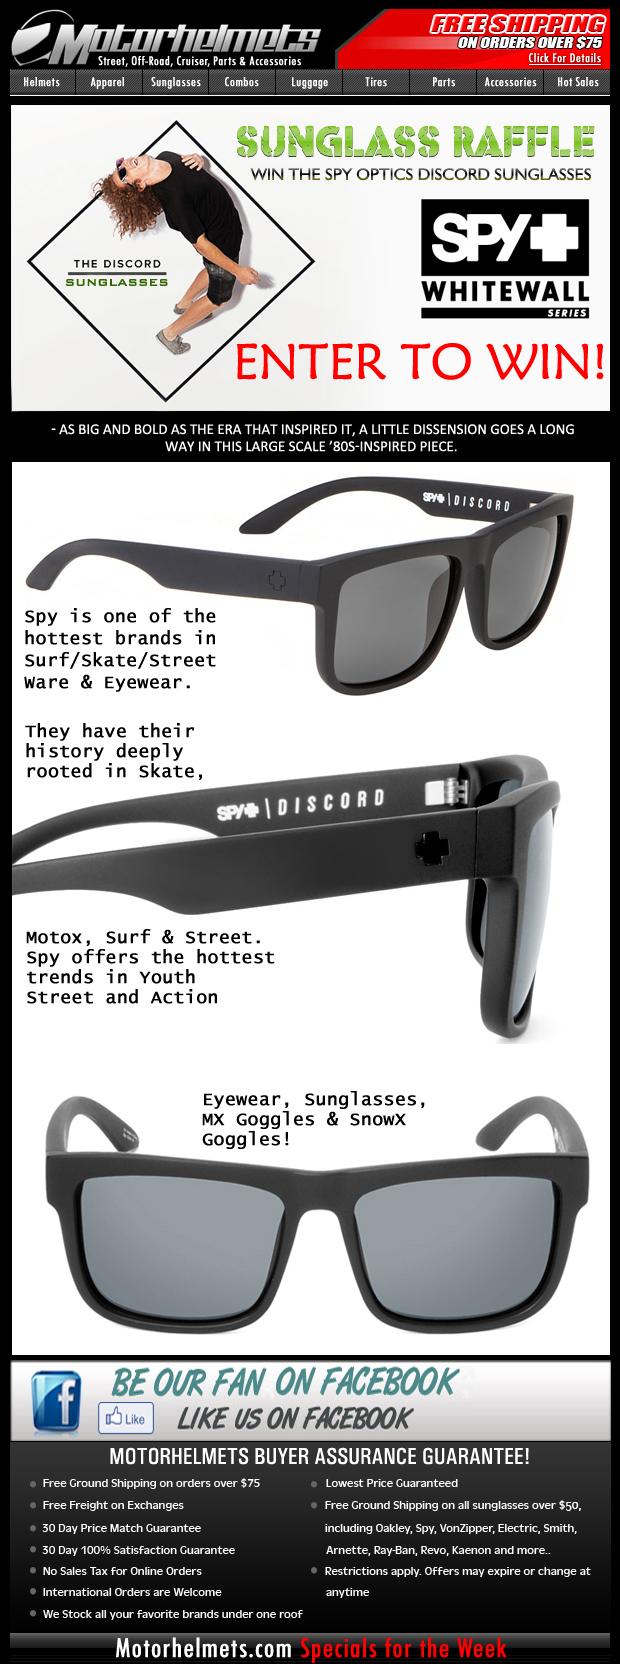 Spy+ Raffle Promo - Win the Spy Discord Sunglasses!